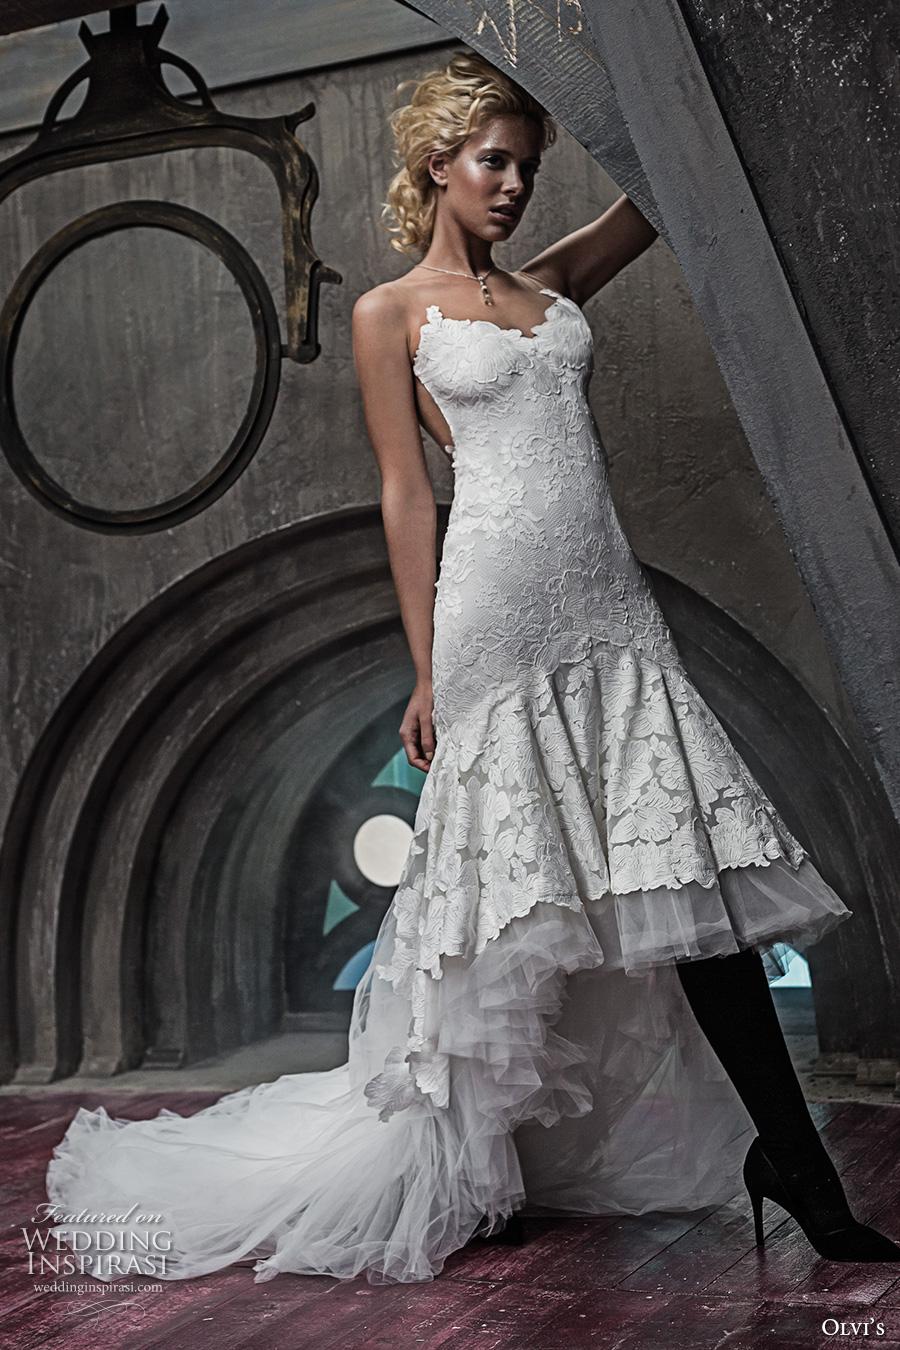 Olga yermoloff 2017 couture wedding dresses crazyforus for High couture wedding dresses